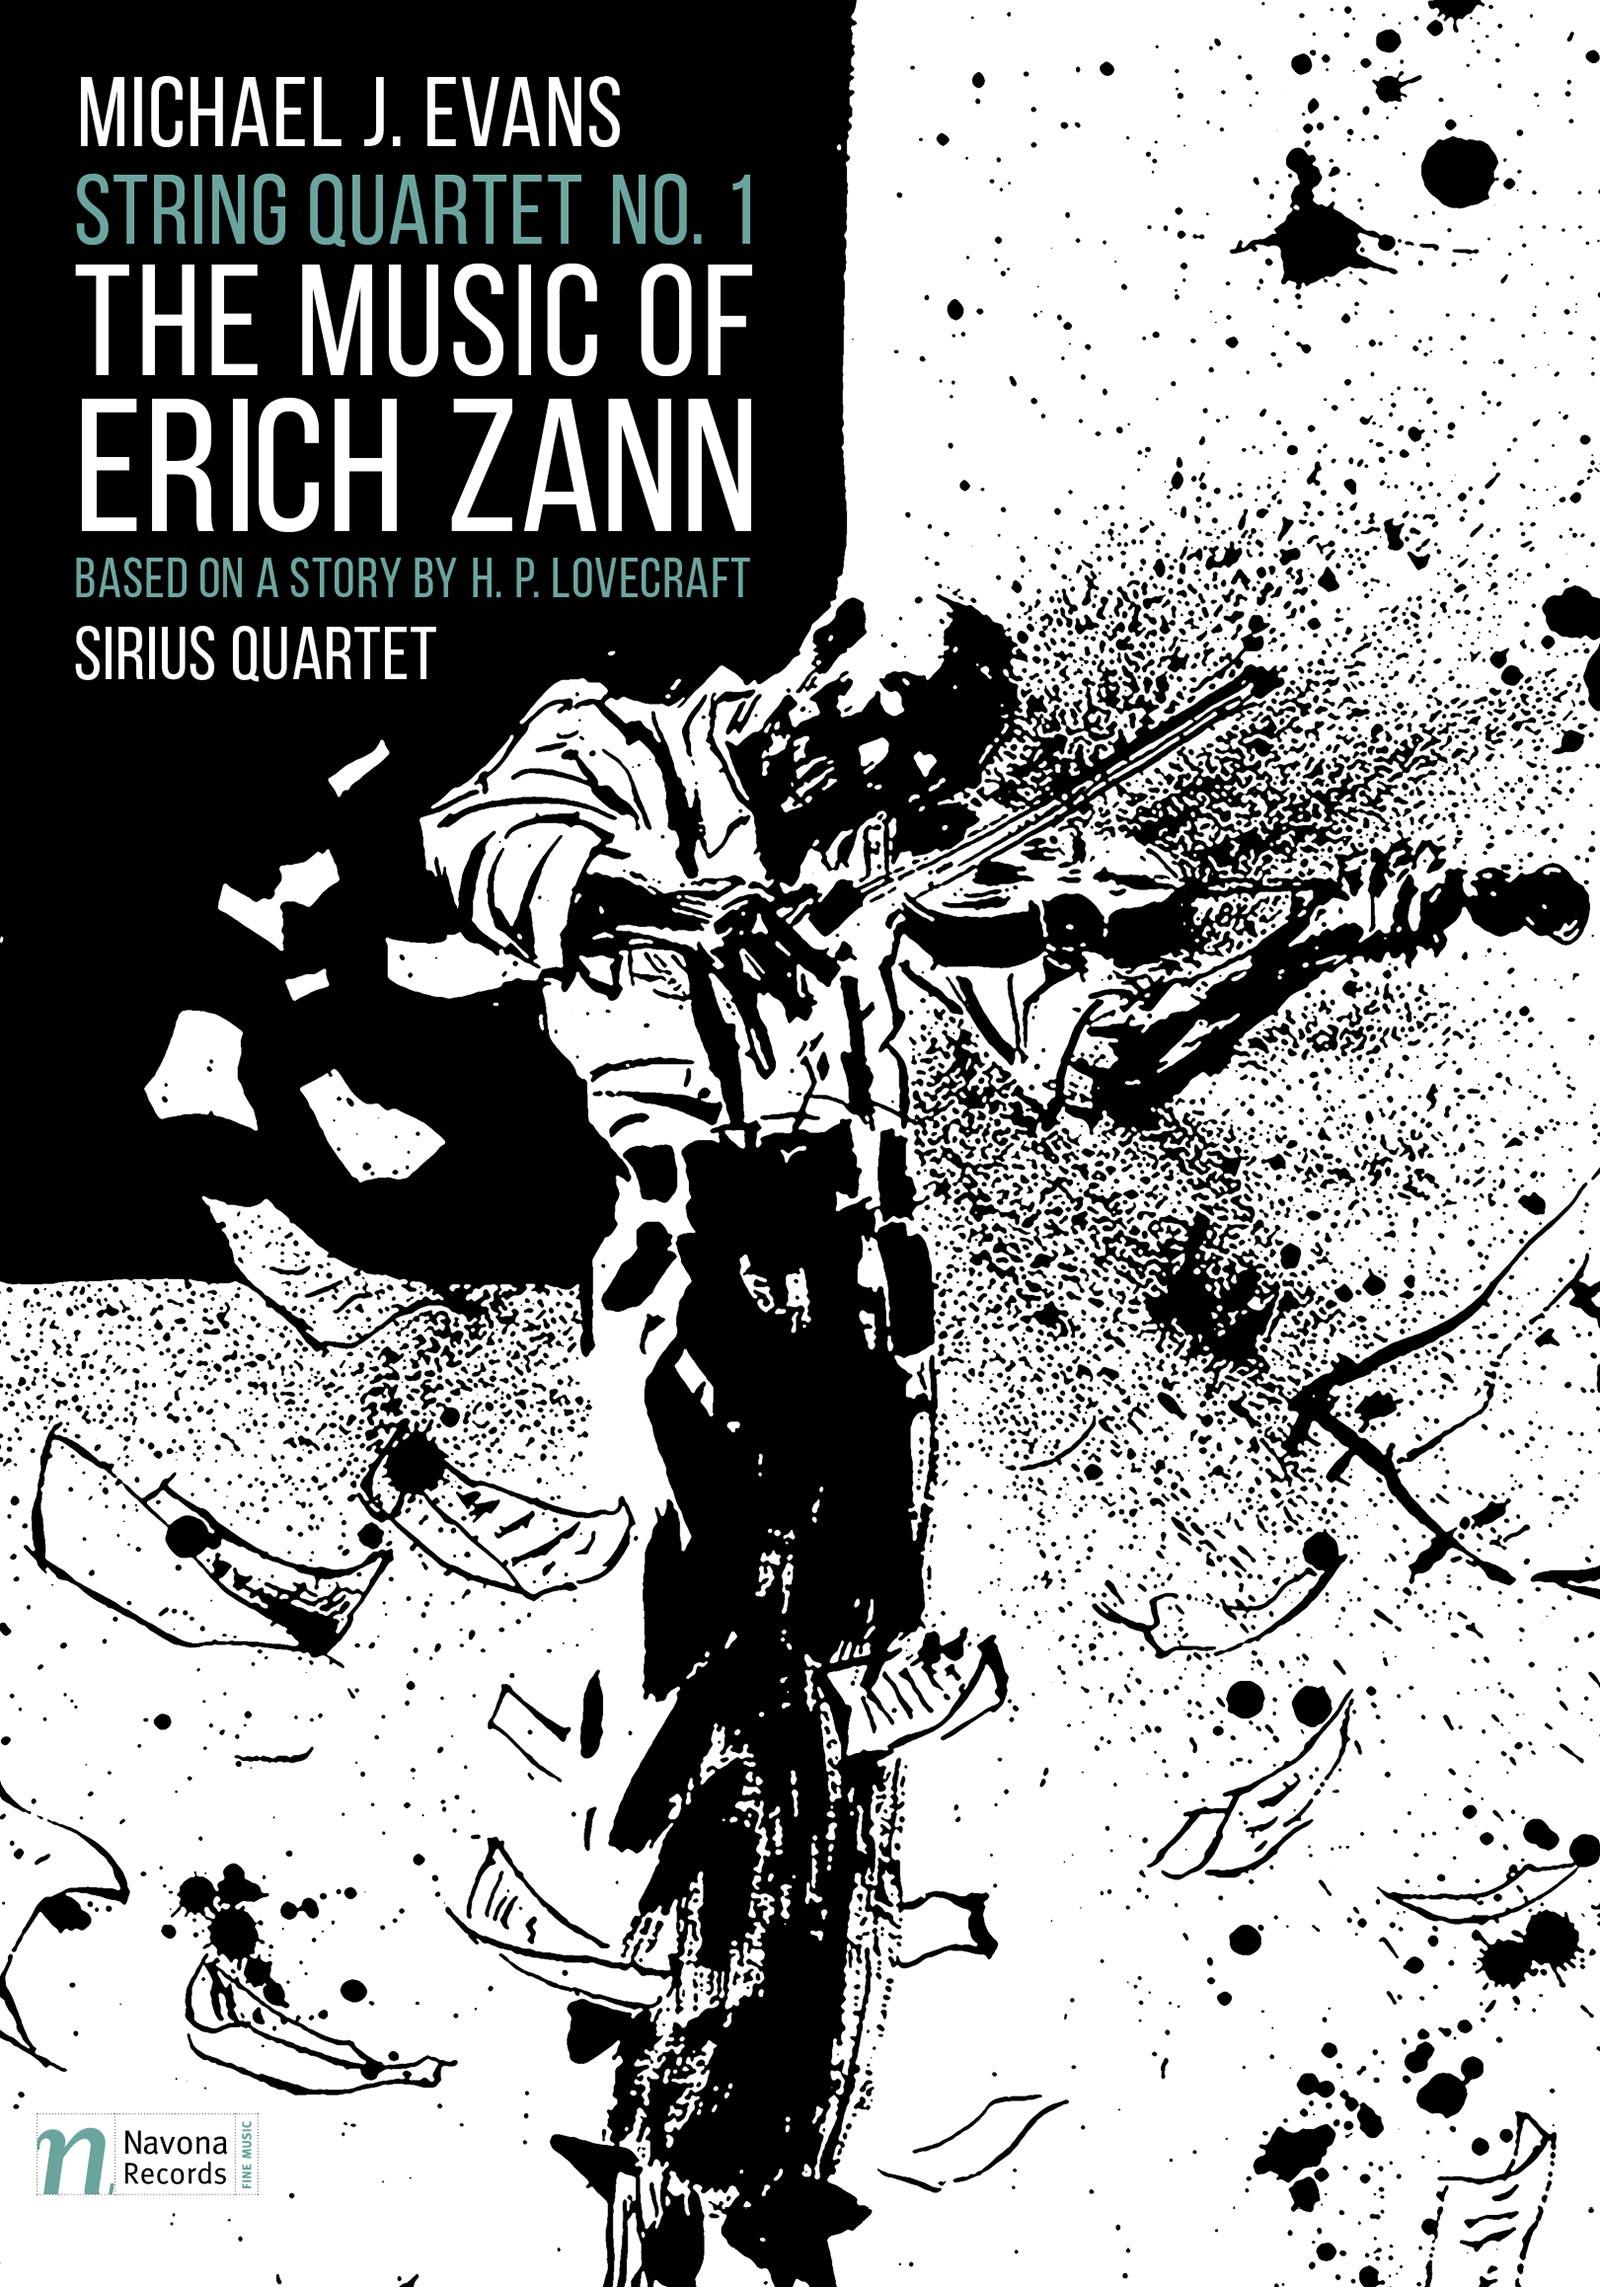 String Quartet No. 1 The Music of Erich Zann